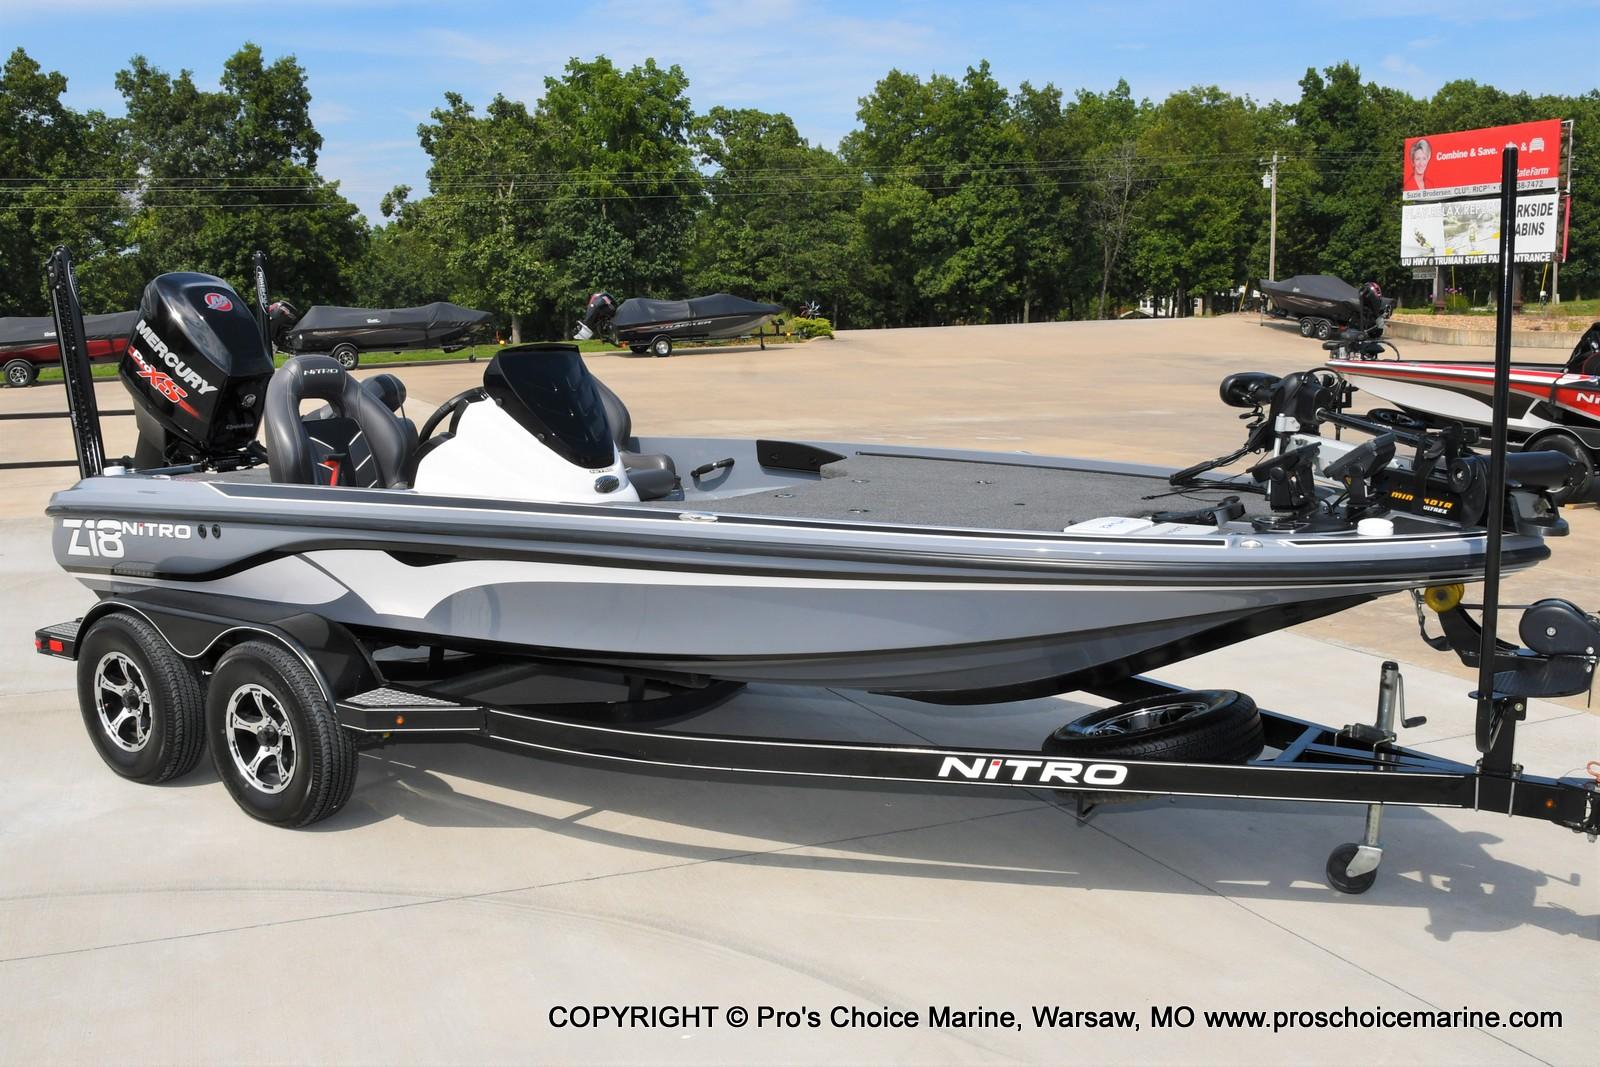 2017 Nitro boat for sale, model of the boat is Z18 & Image # 9 of 50